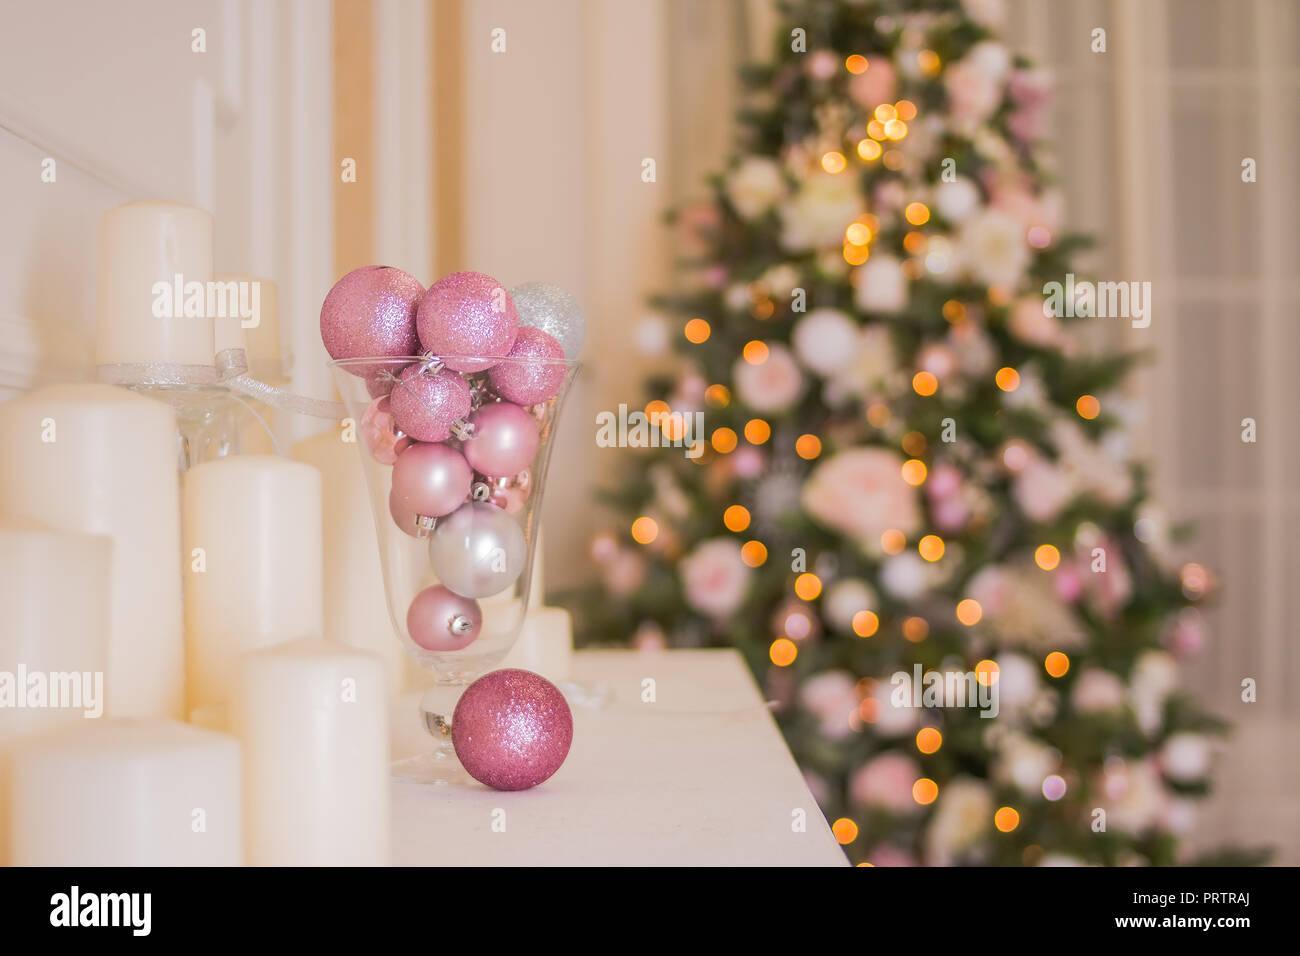 f70430b72c5b Chimenea Blanca Imágenes De Stock & Chimenea Blanca Fotos De Stock ...